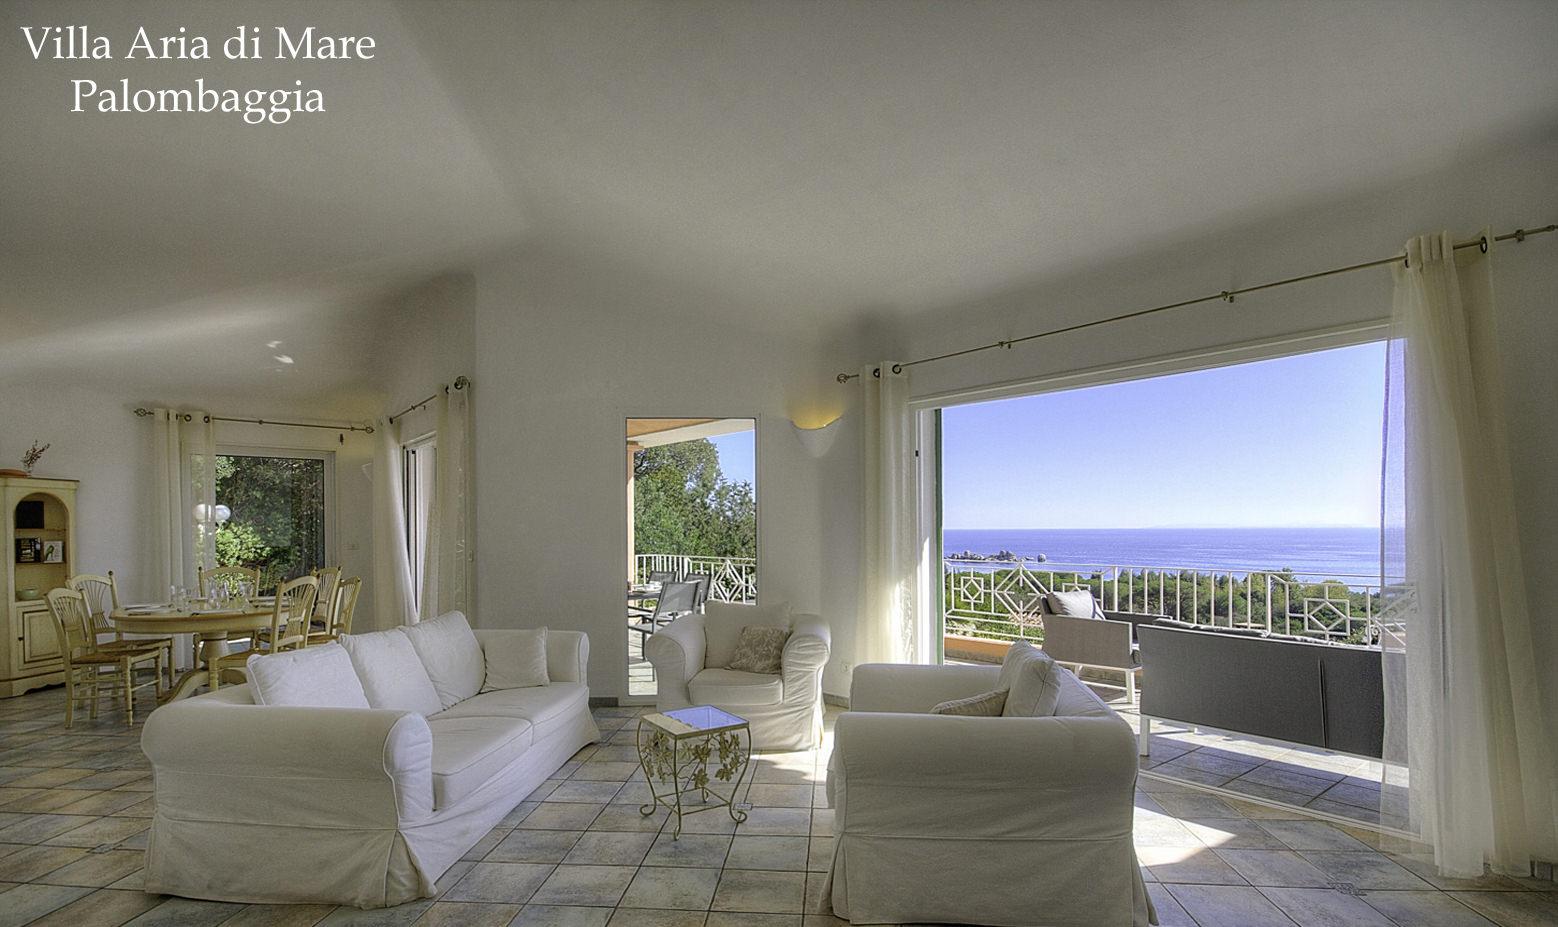 Maison luxe Palombaggia avec piscine et vue mer